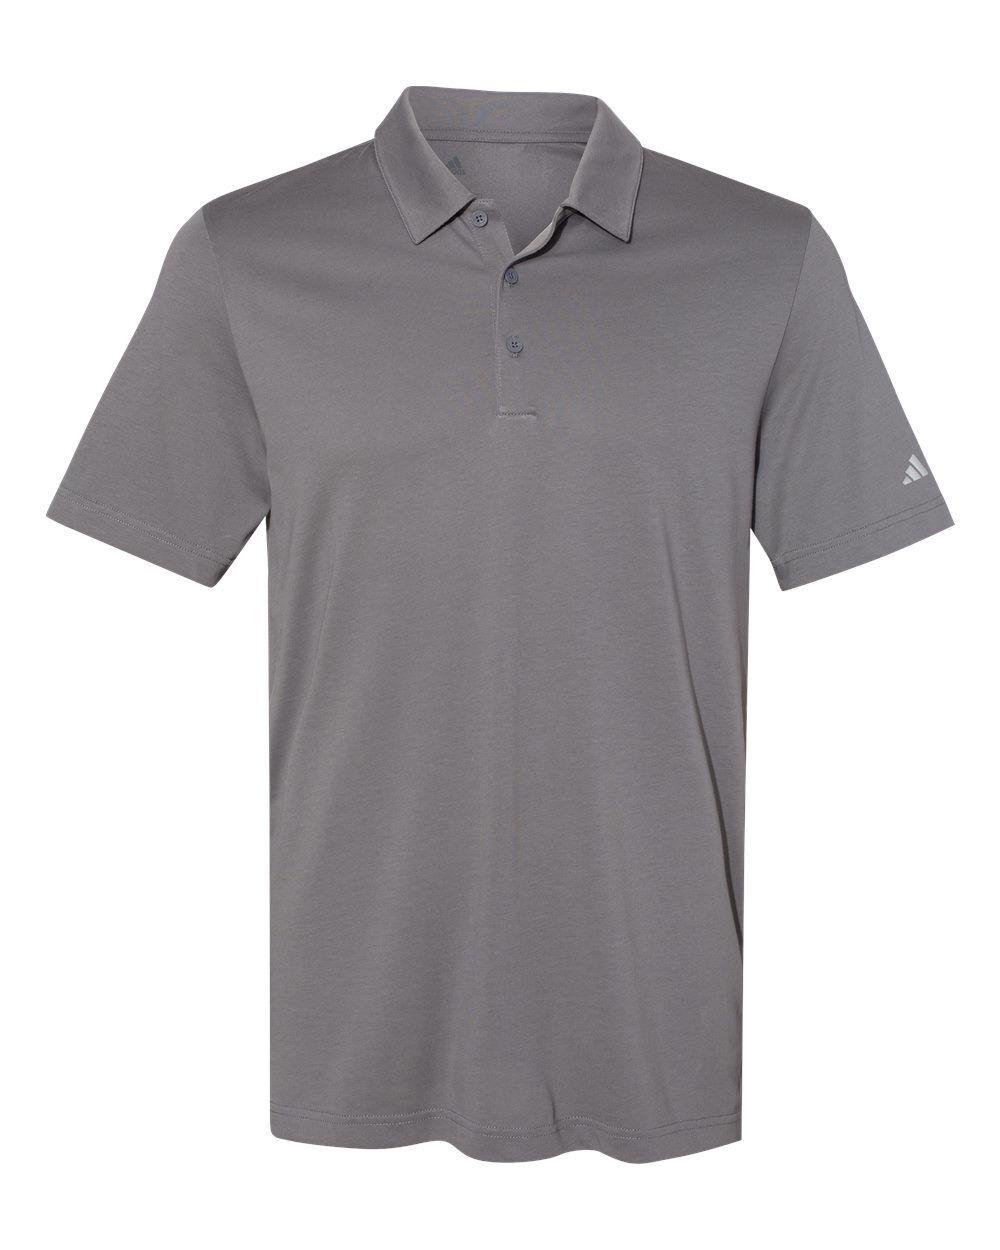 Adidas - Cotton Blend Sport Shirt - A322 - Grey Four - X-Large